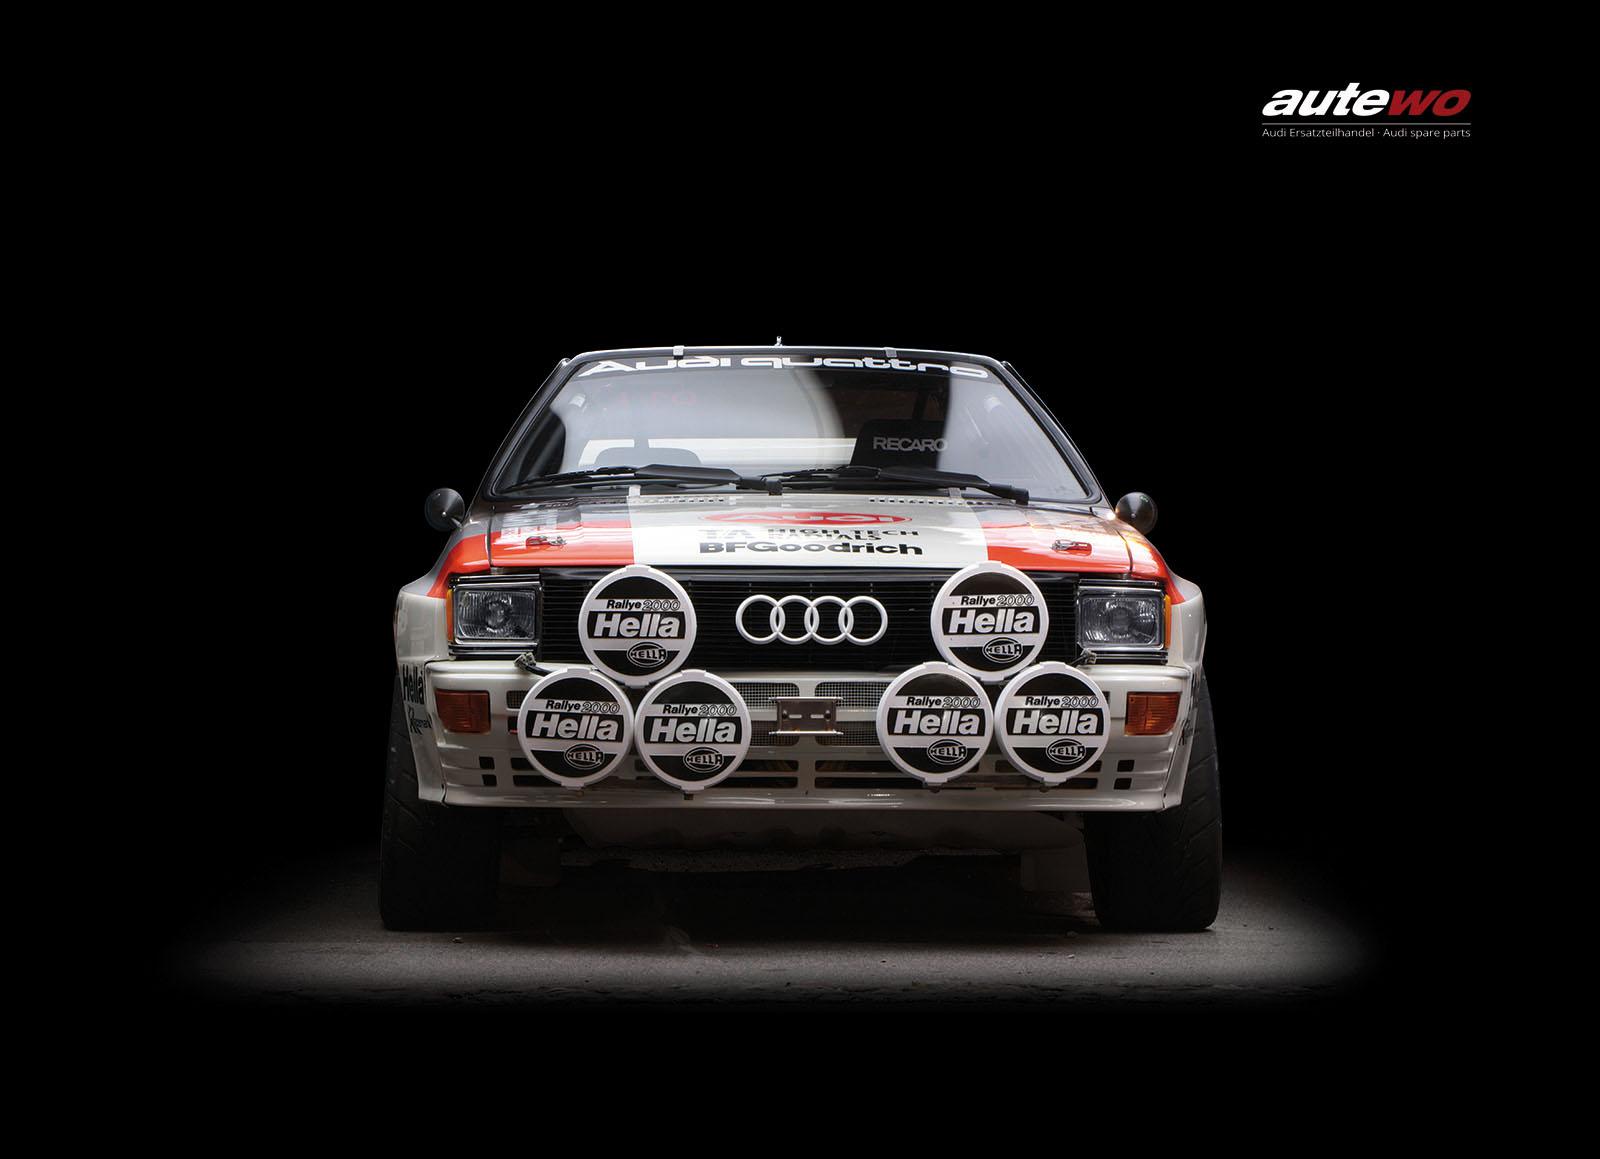 autewo-Poster DIN A2  Motiv original Audi Rallye Quattro A1